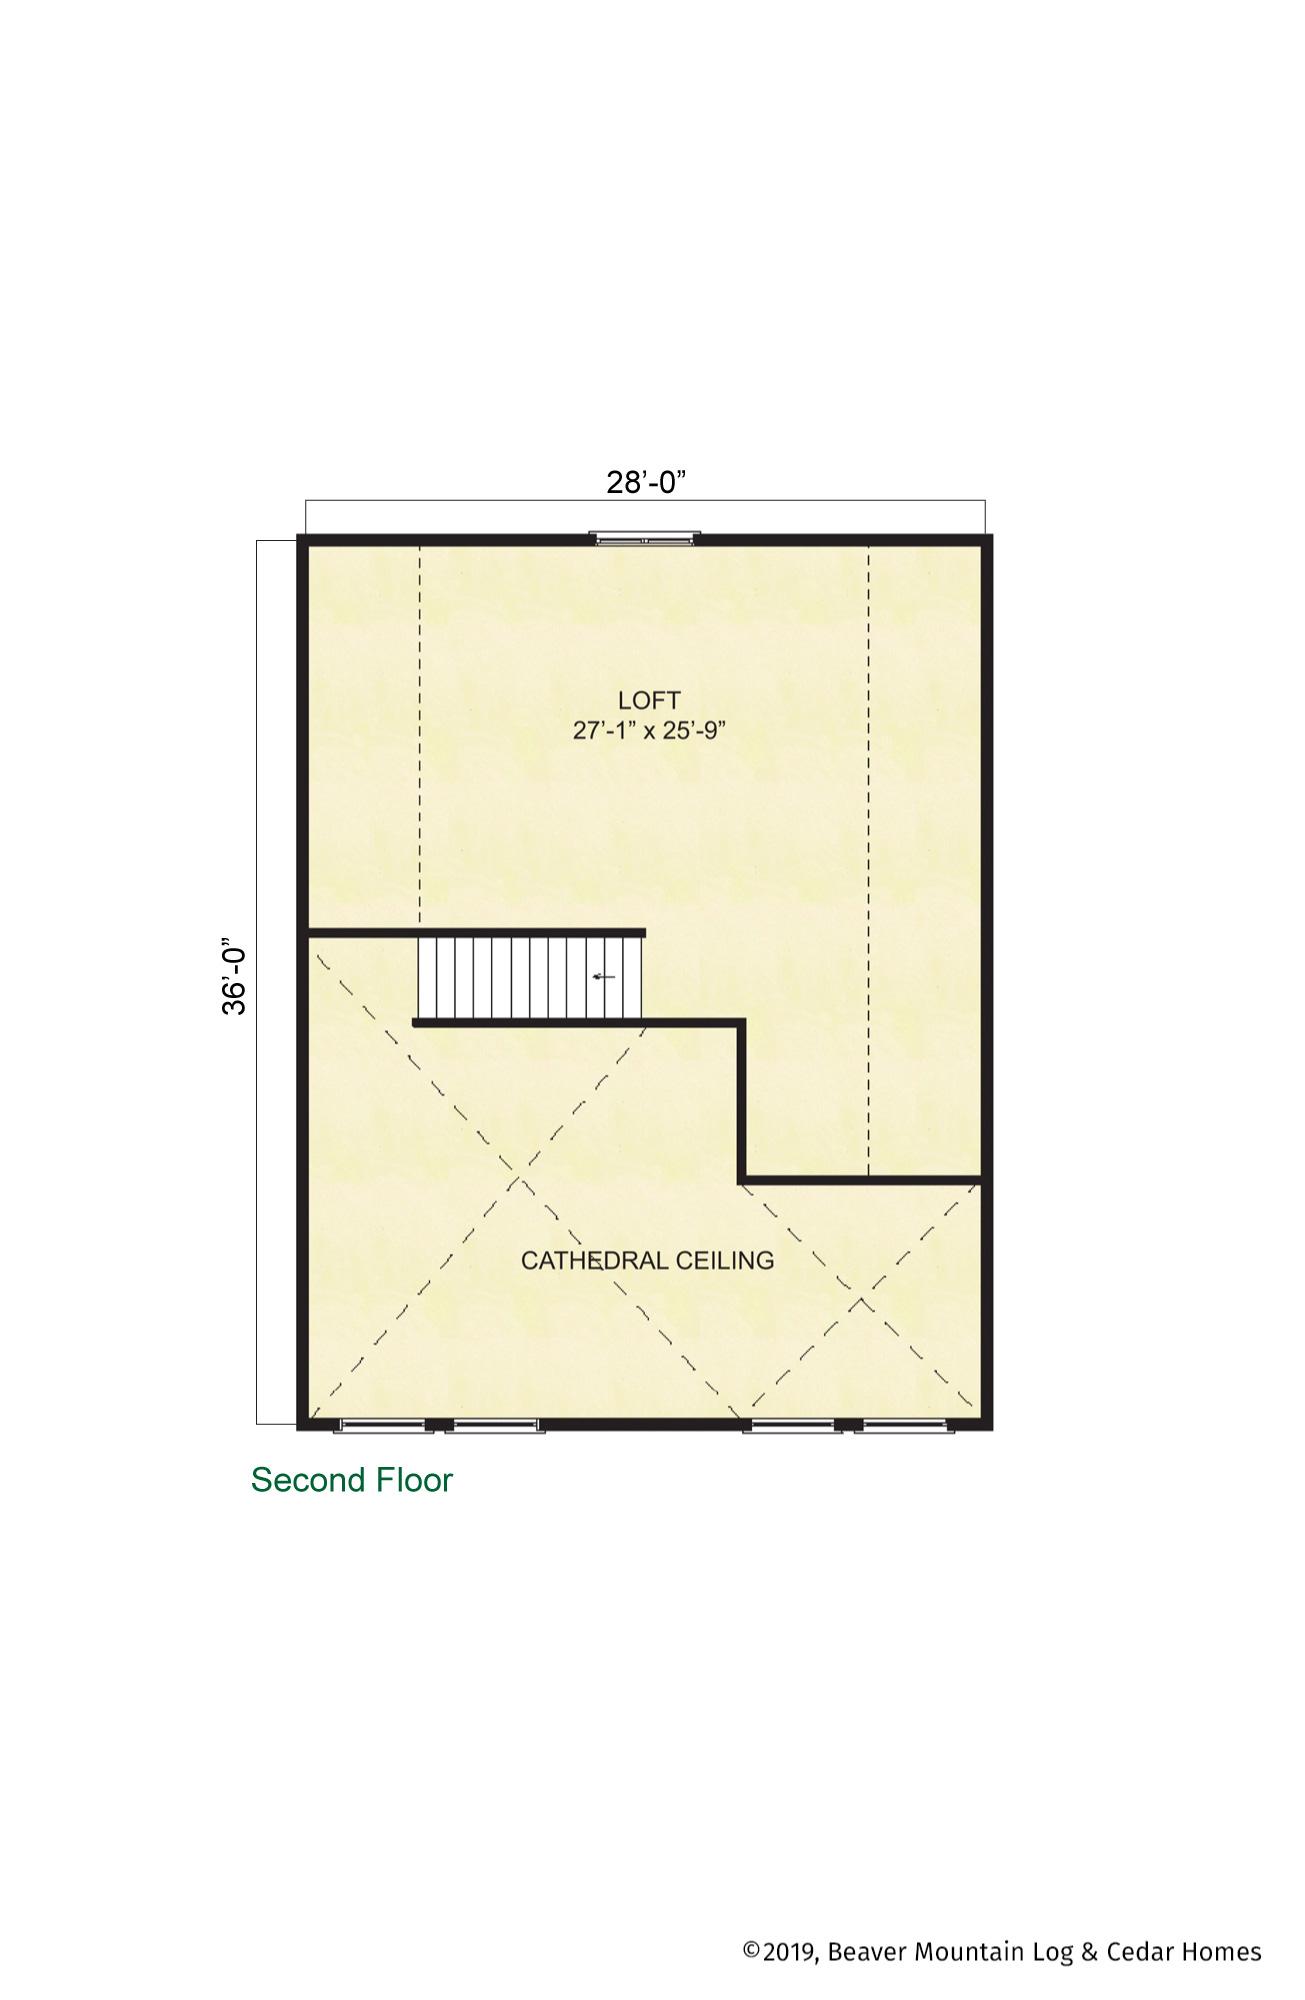 Beaver Mountain Log Homes Coxsackie Timber's Home Upper Level Floor Plan